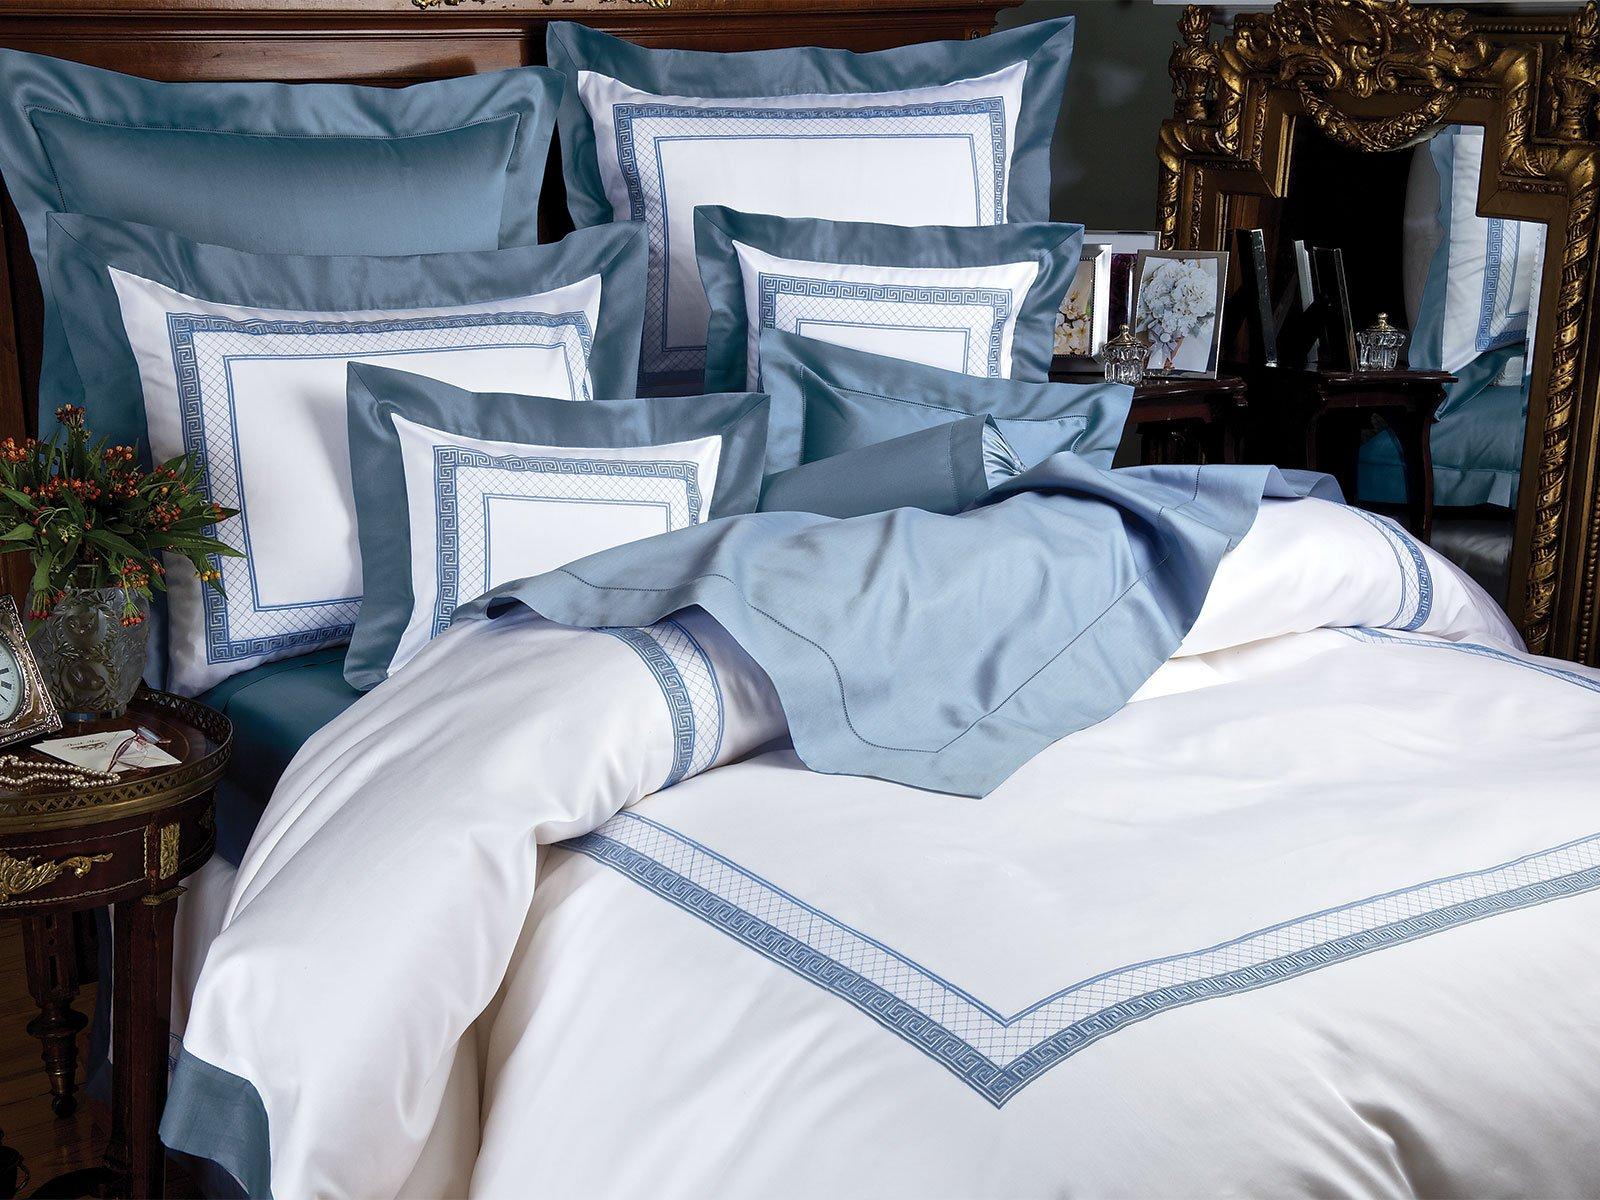 Acropolis Bedding Luxury Bedding Italian Bed Linens